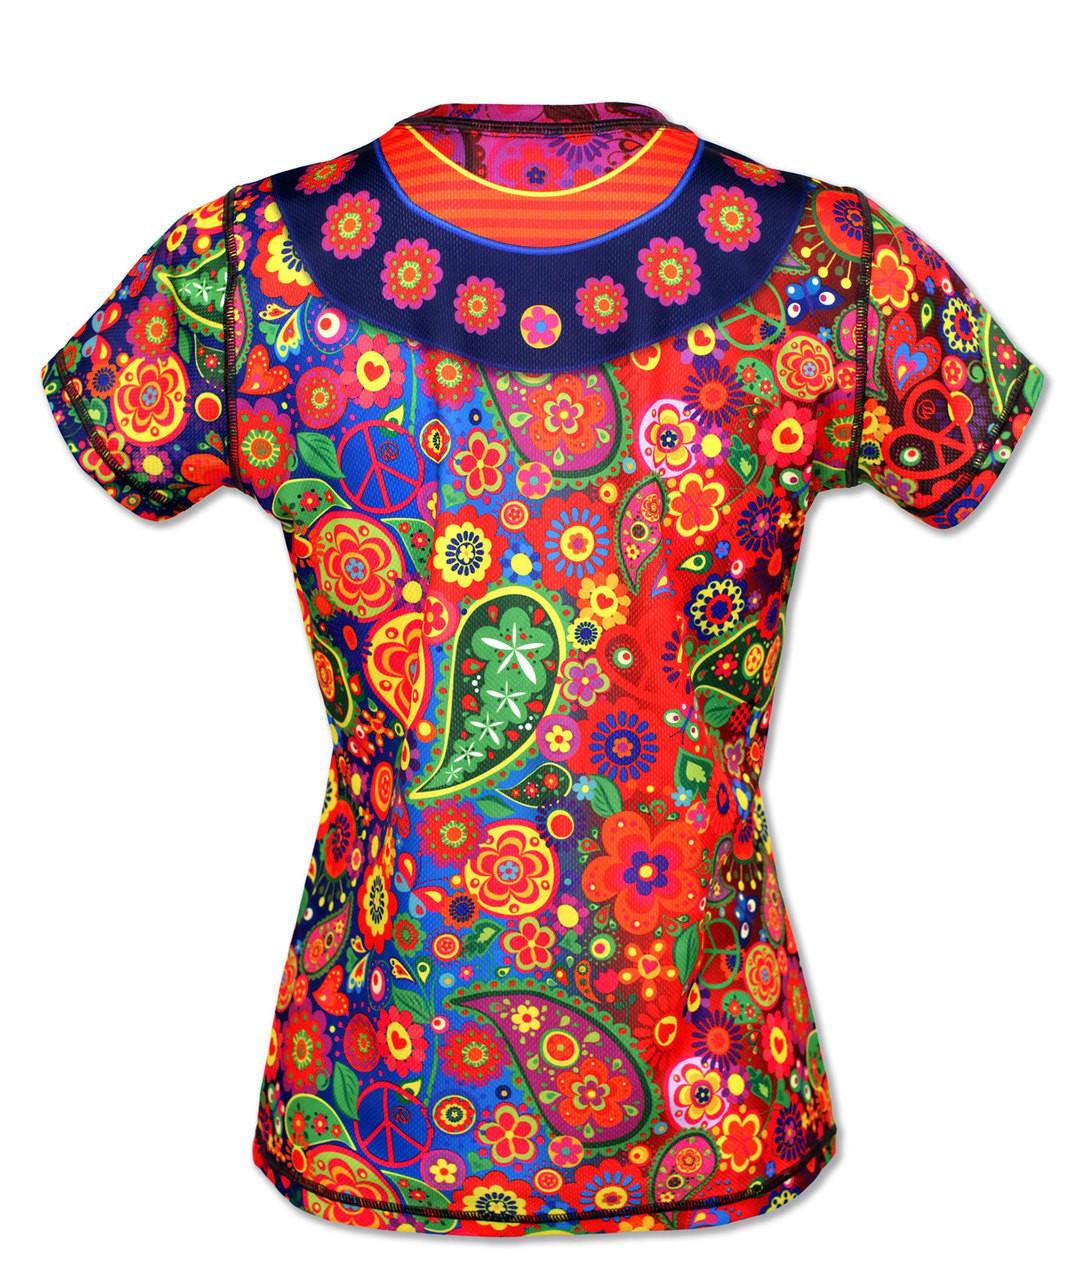 INKnBURN Peace Tech Shirt Back